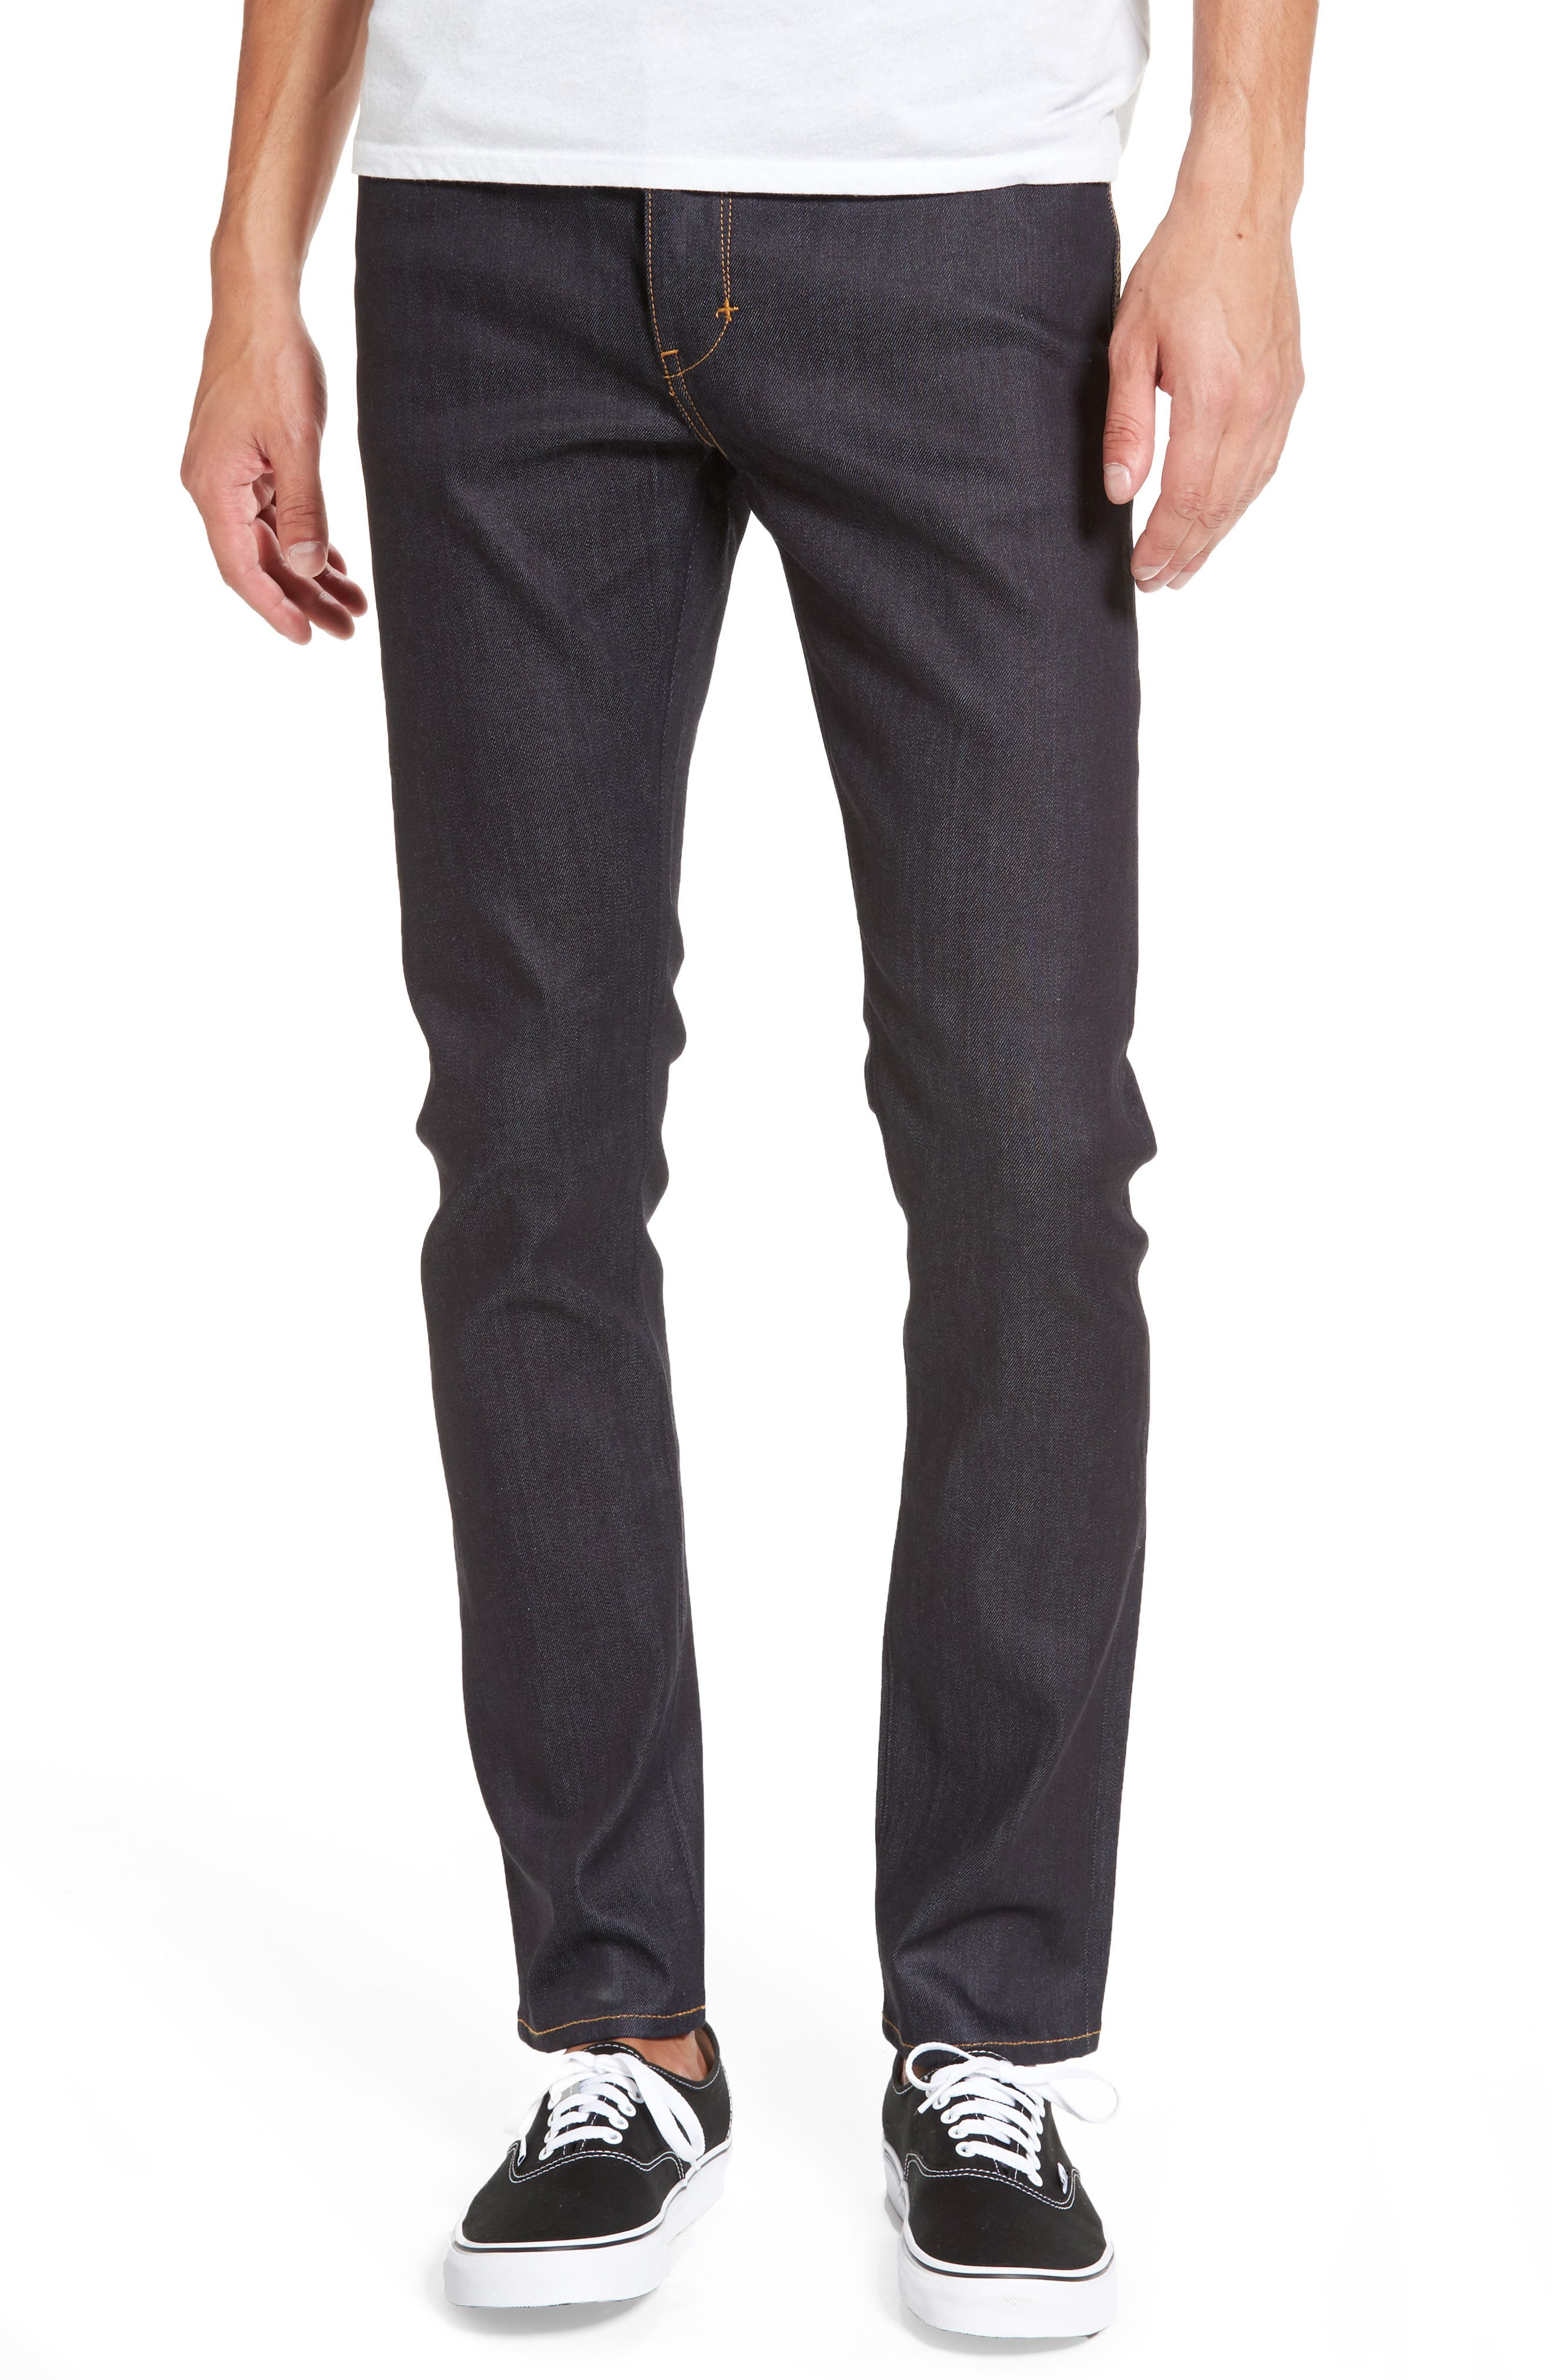 Iggy Skinny Jeans,                         Main,                         color, Raw Stretch